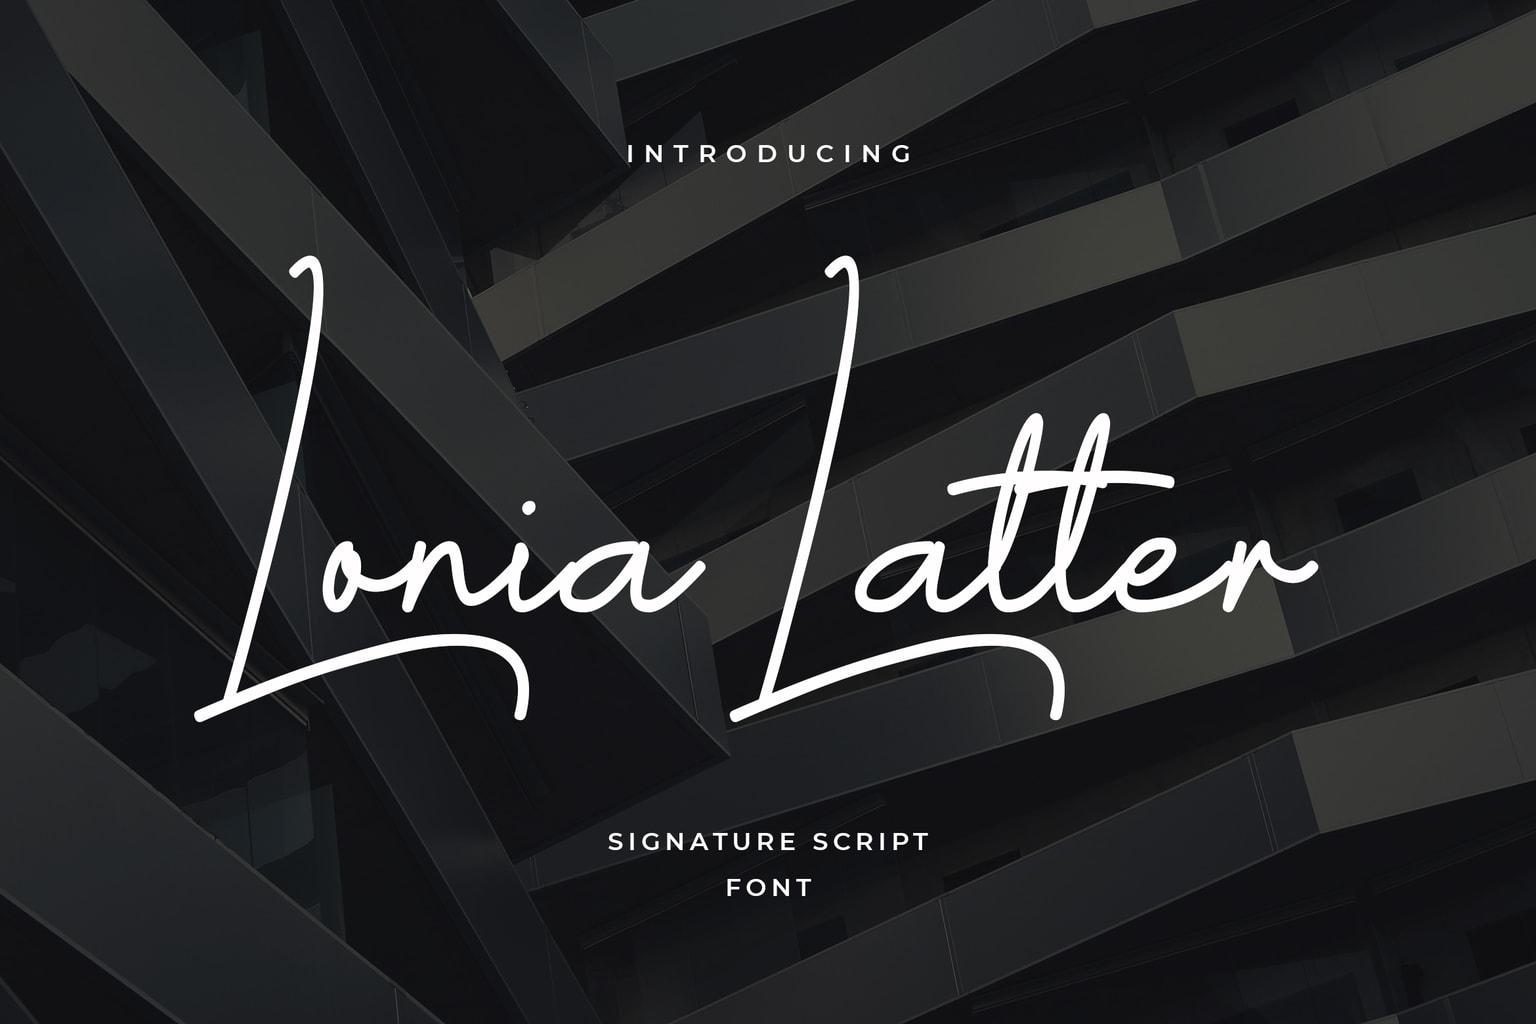 fonts lonia latter script